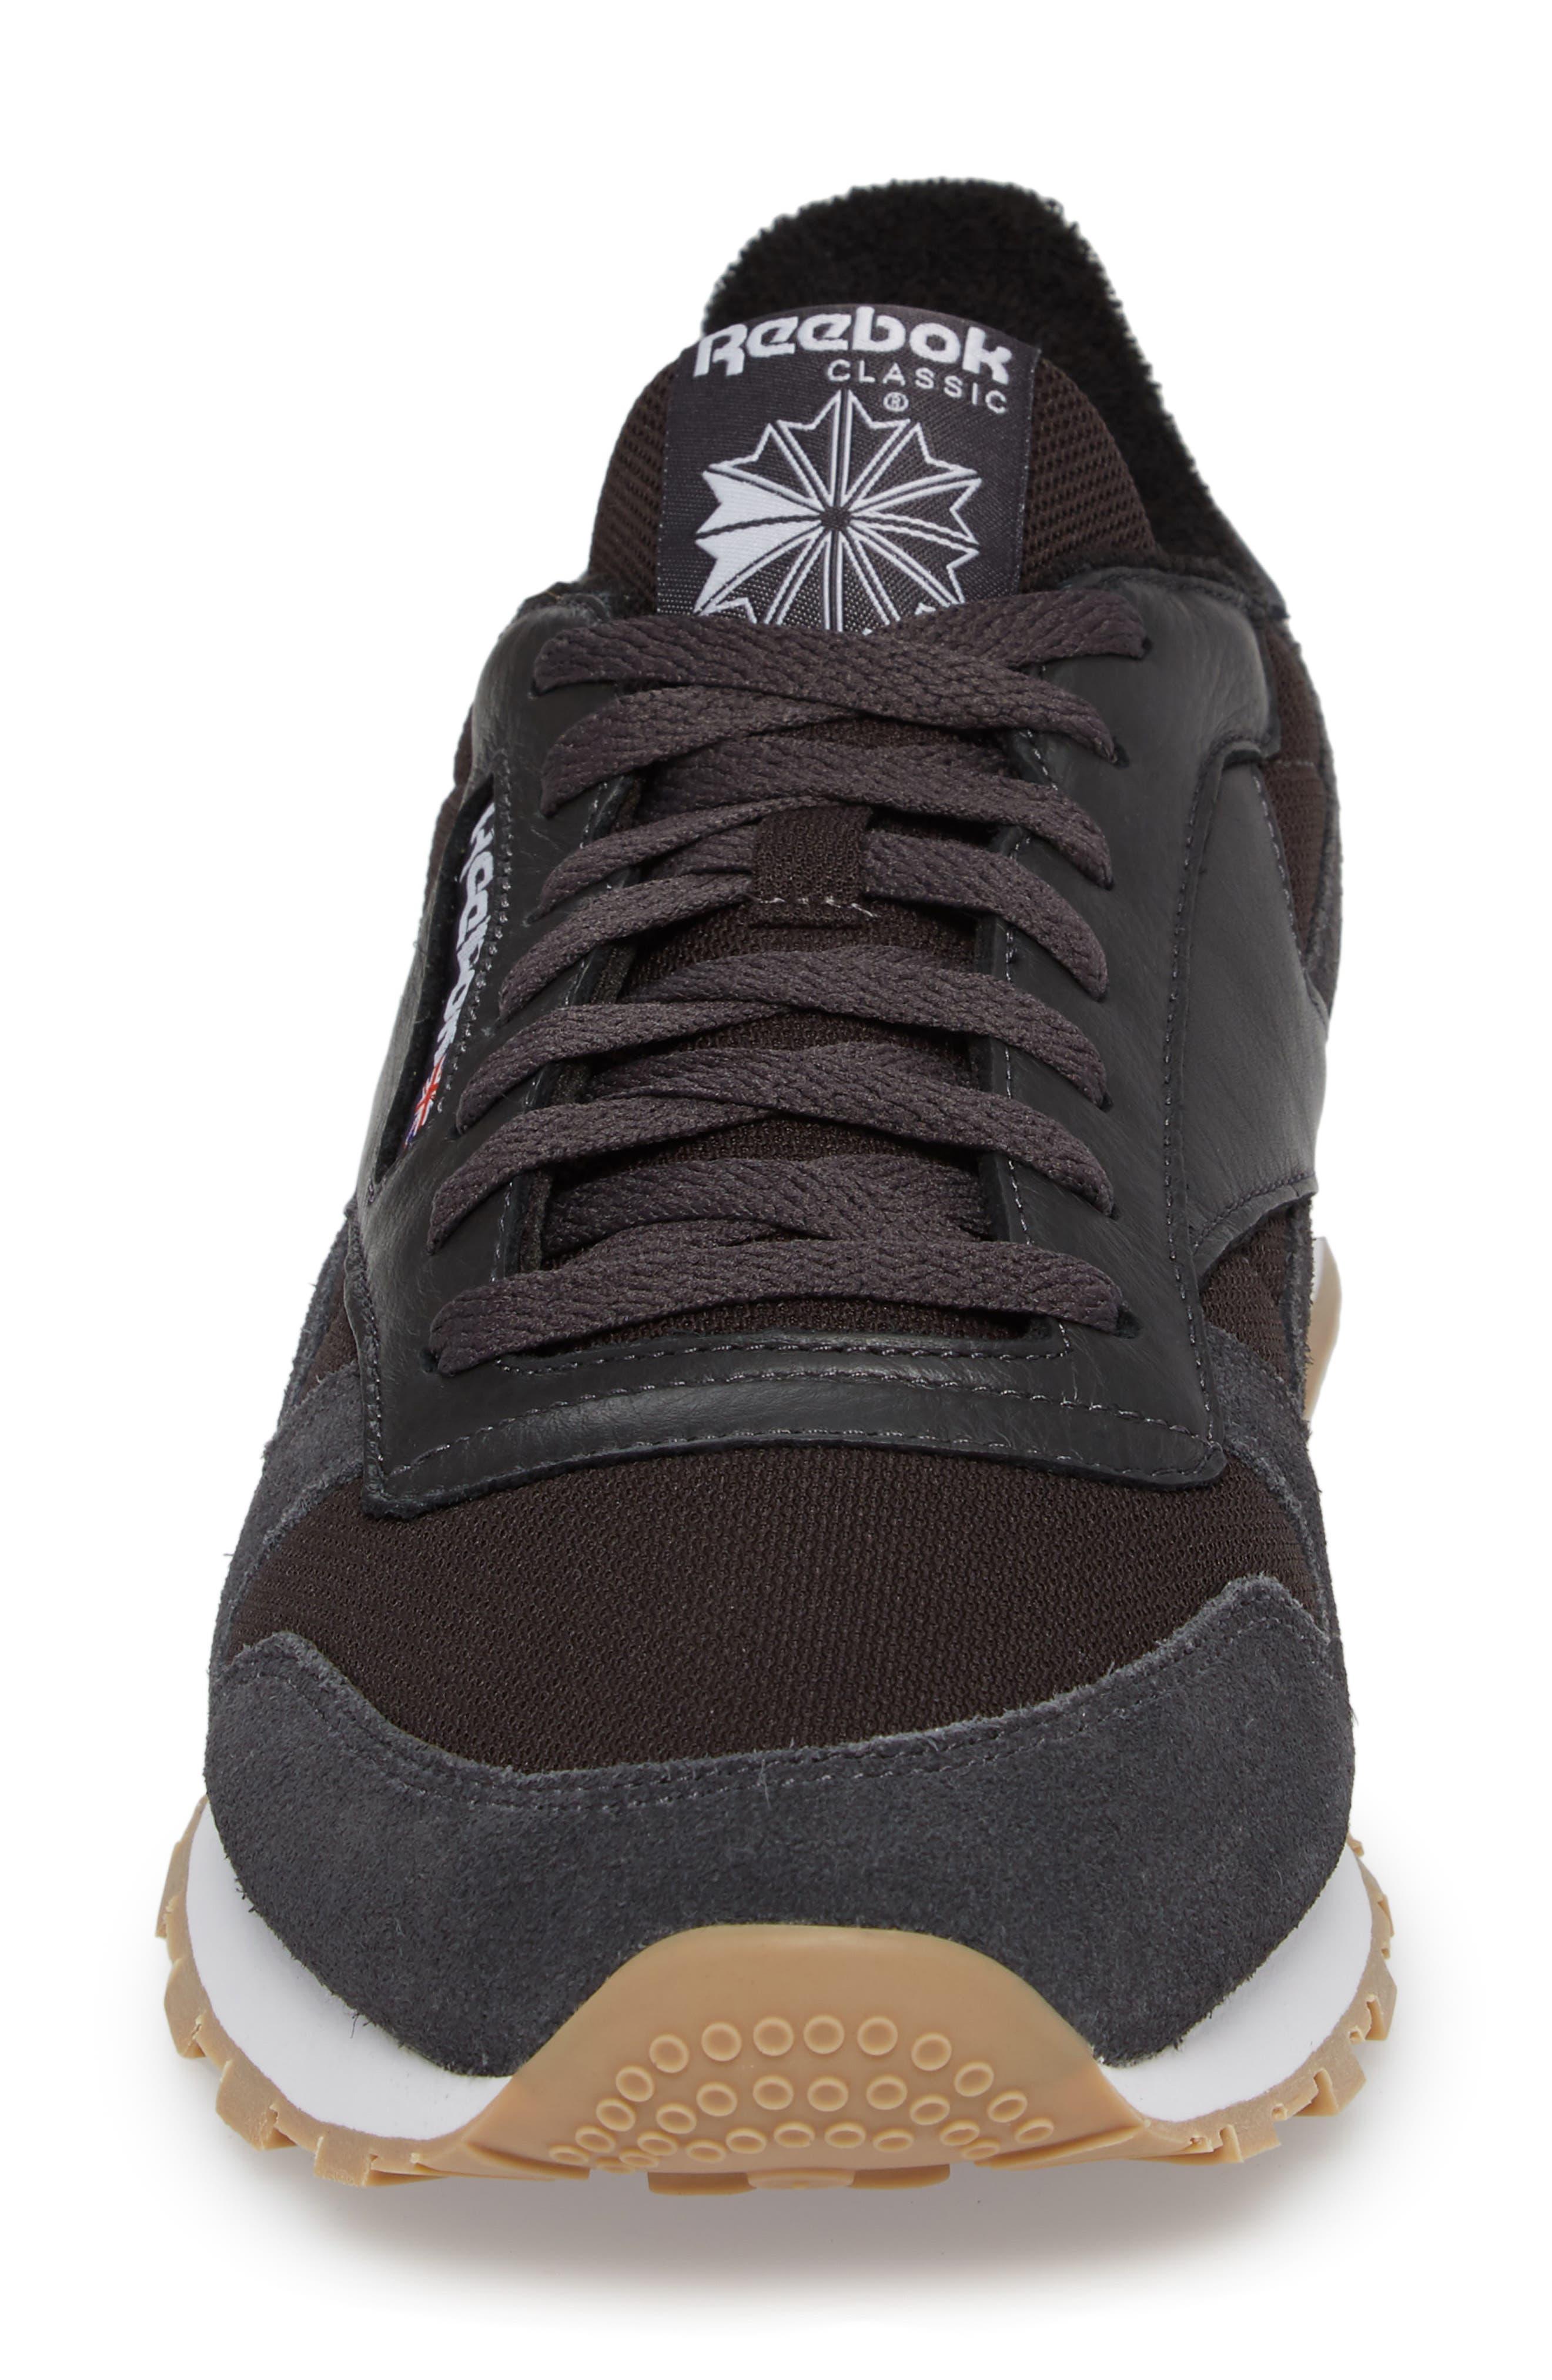 ESTL Classic Leather Sneaker,                             Alternate thumbnail 4, color,                             001